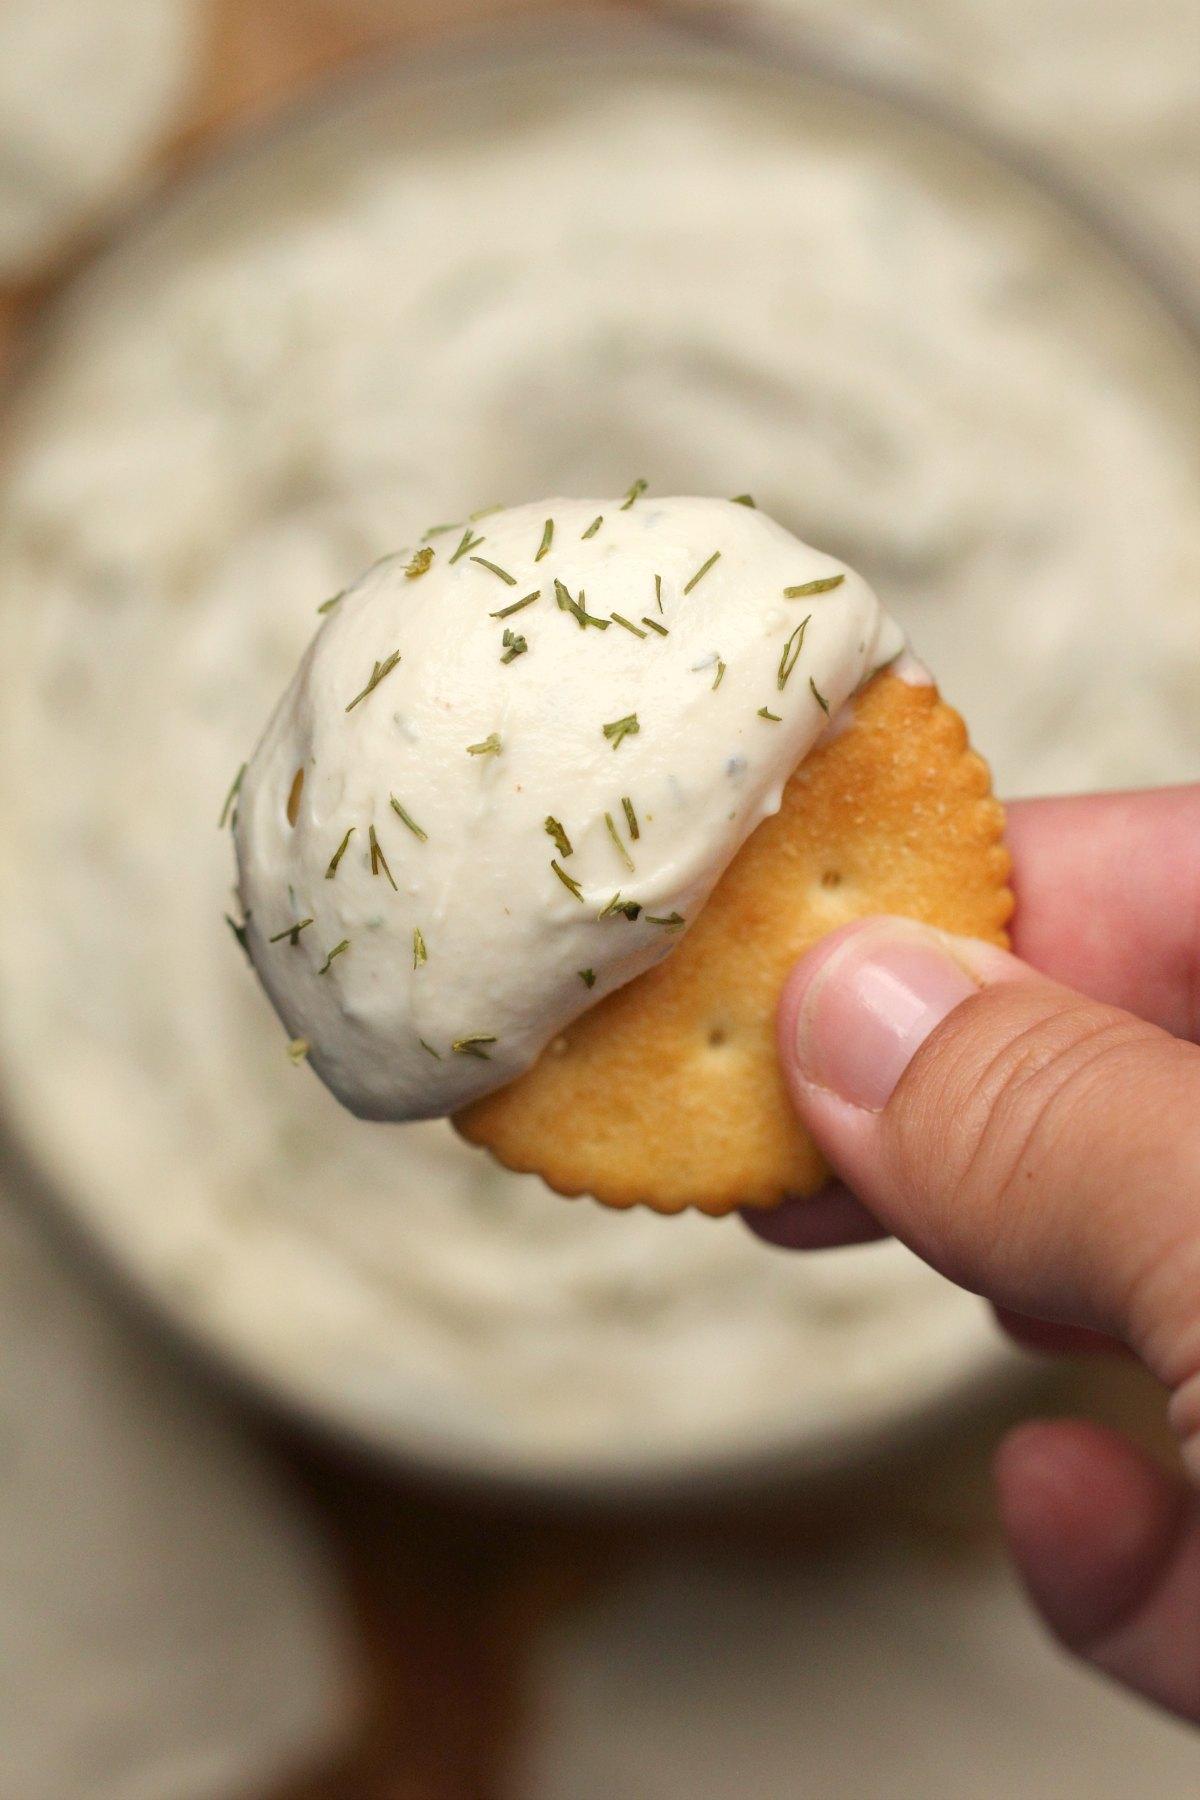 A cracker with vegan cream cheese.